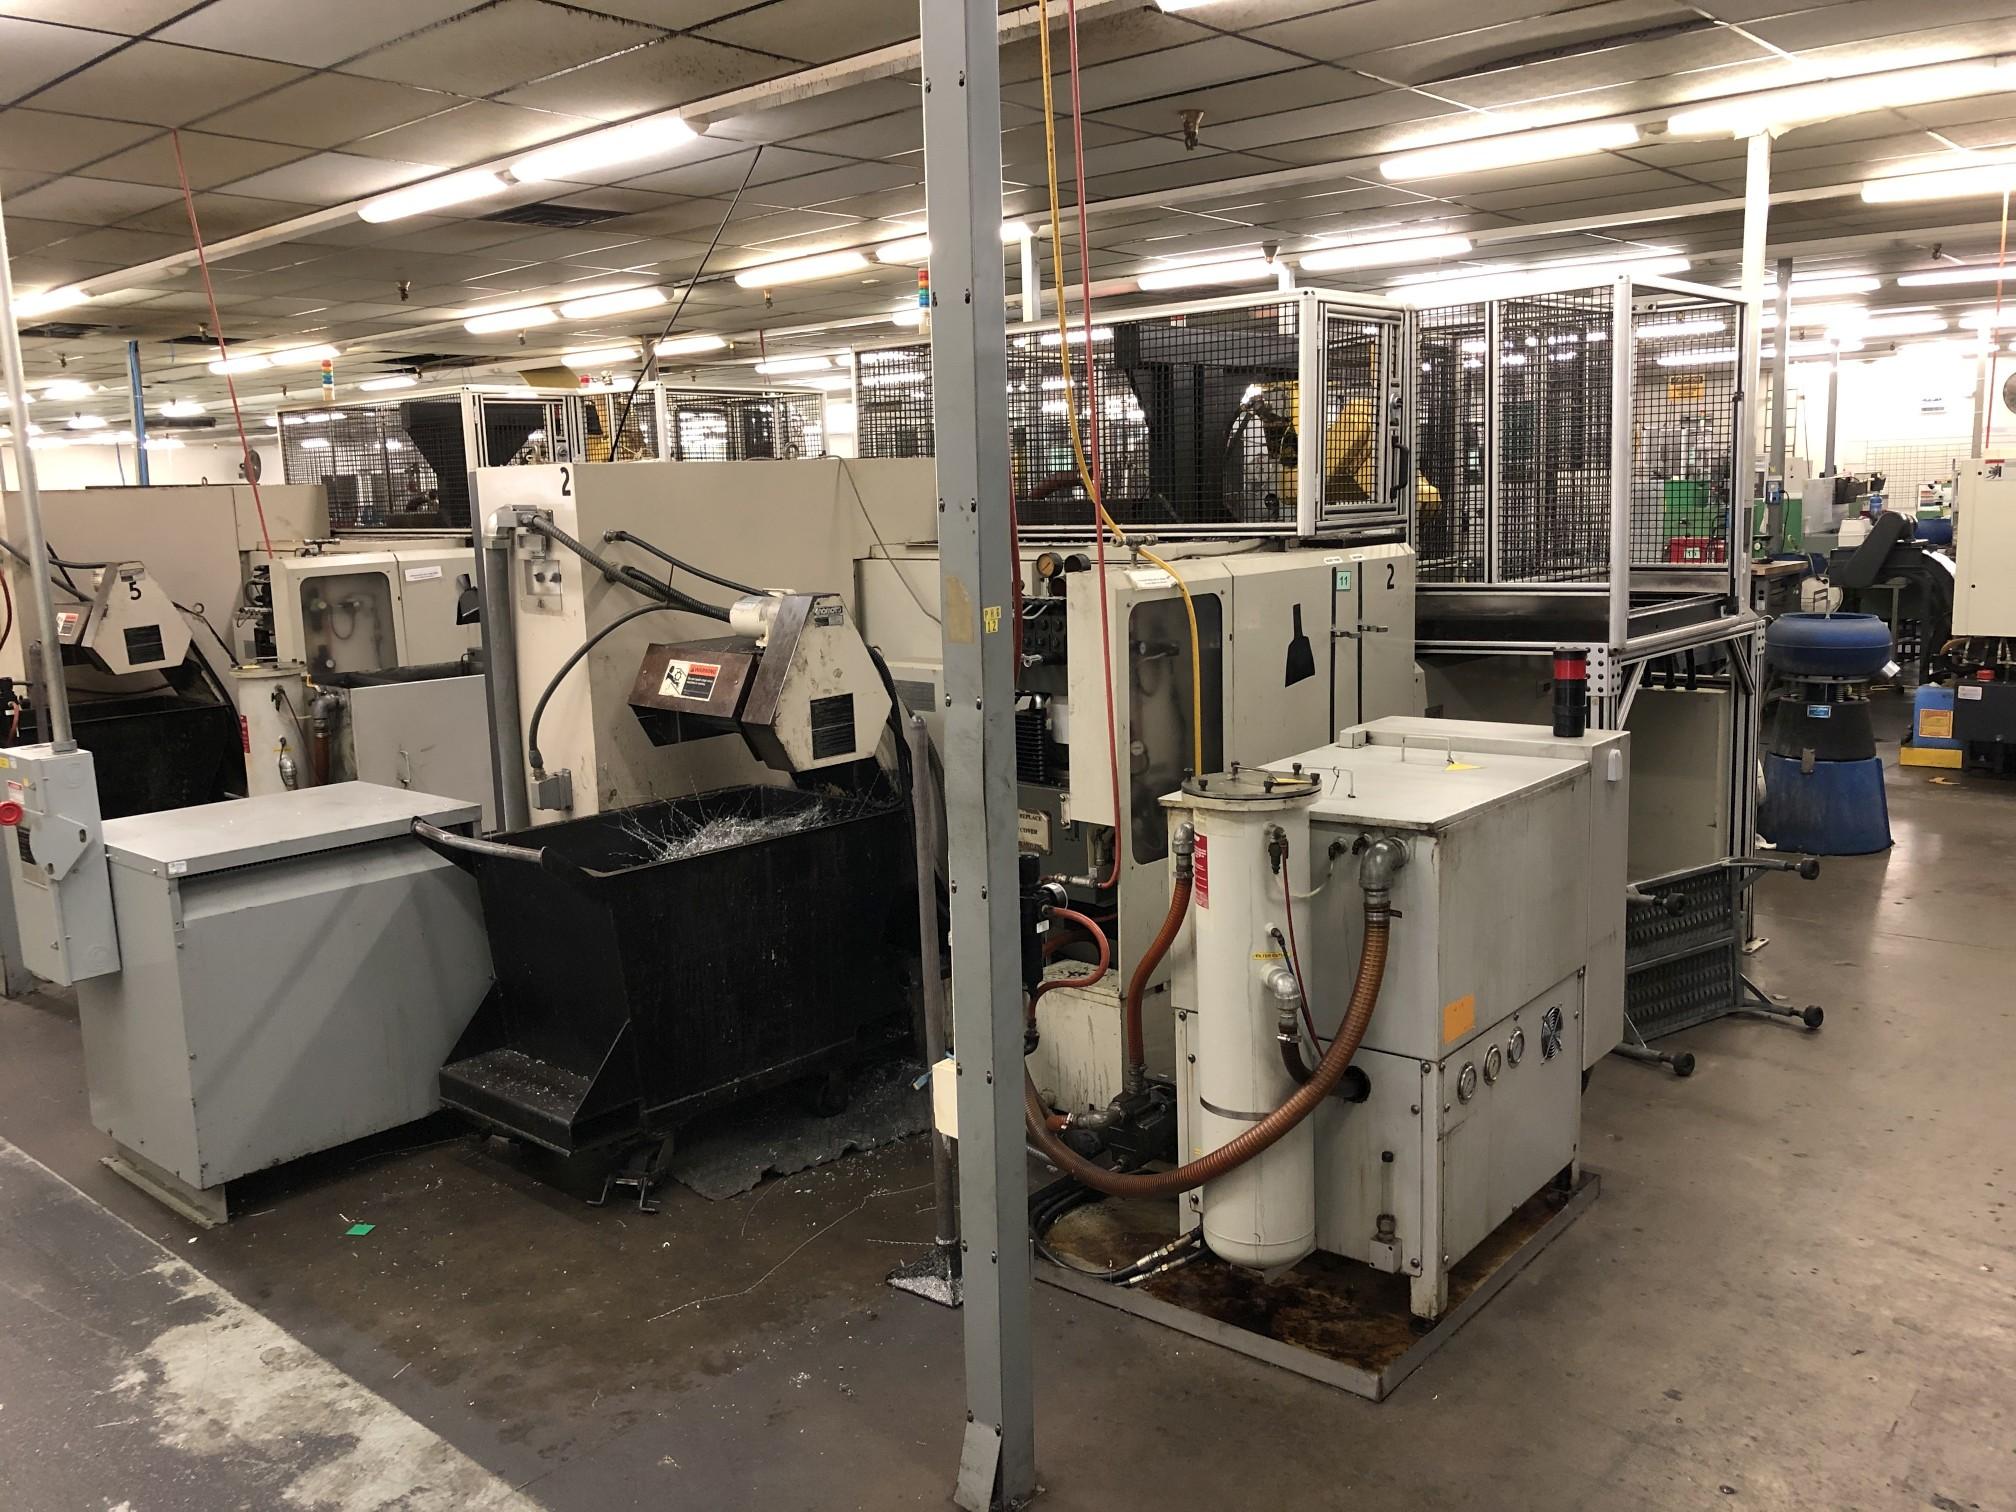 1999 Kitako MT4-200 Multi-Spindle CNC Turning Mill - Image 10 of 17